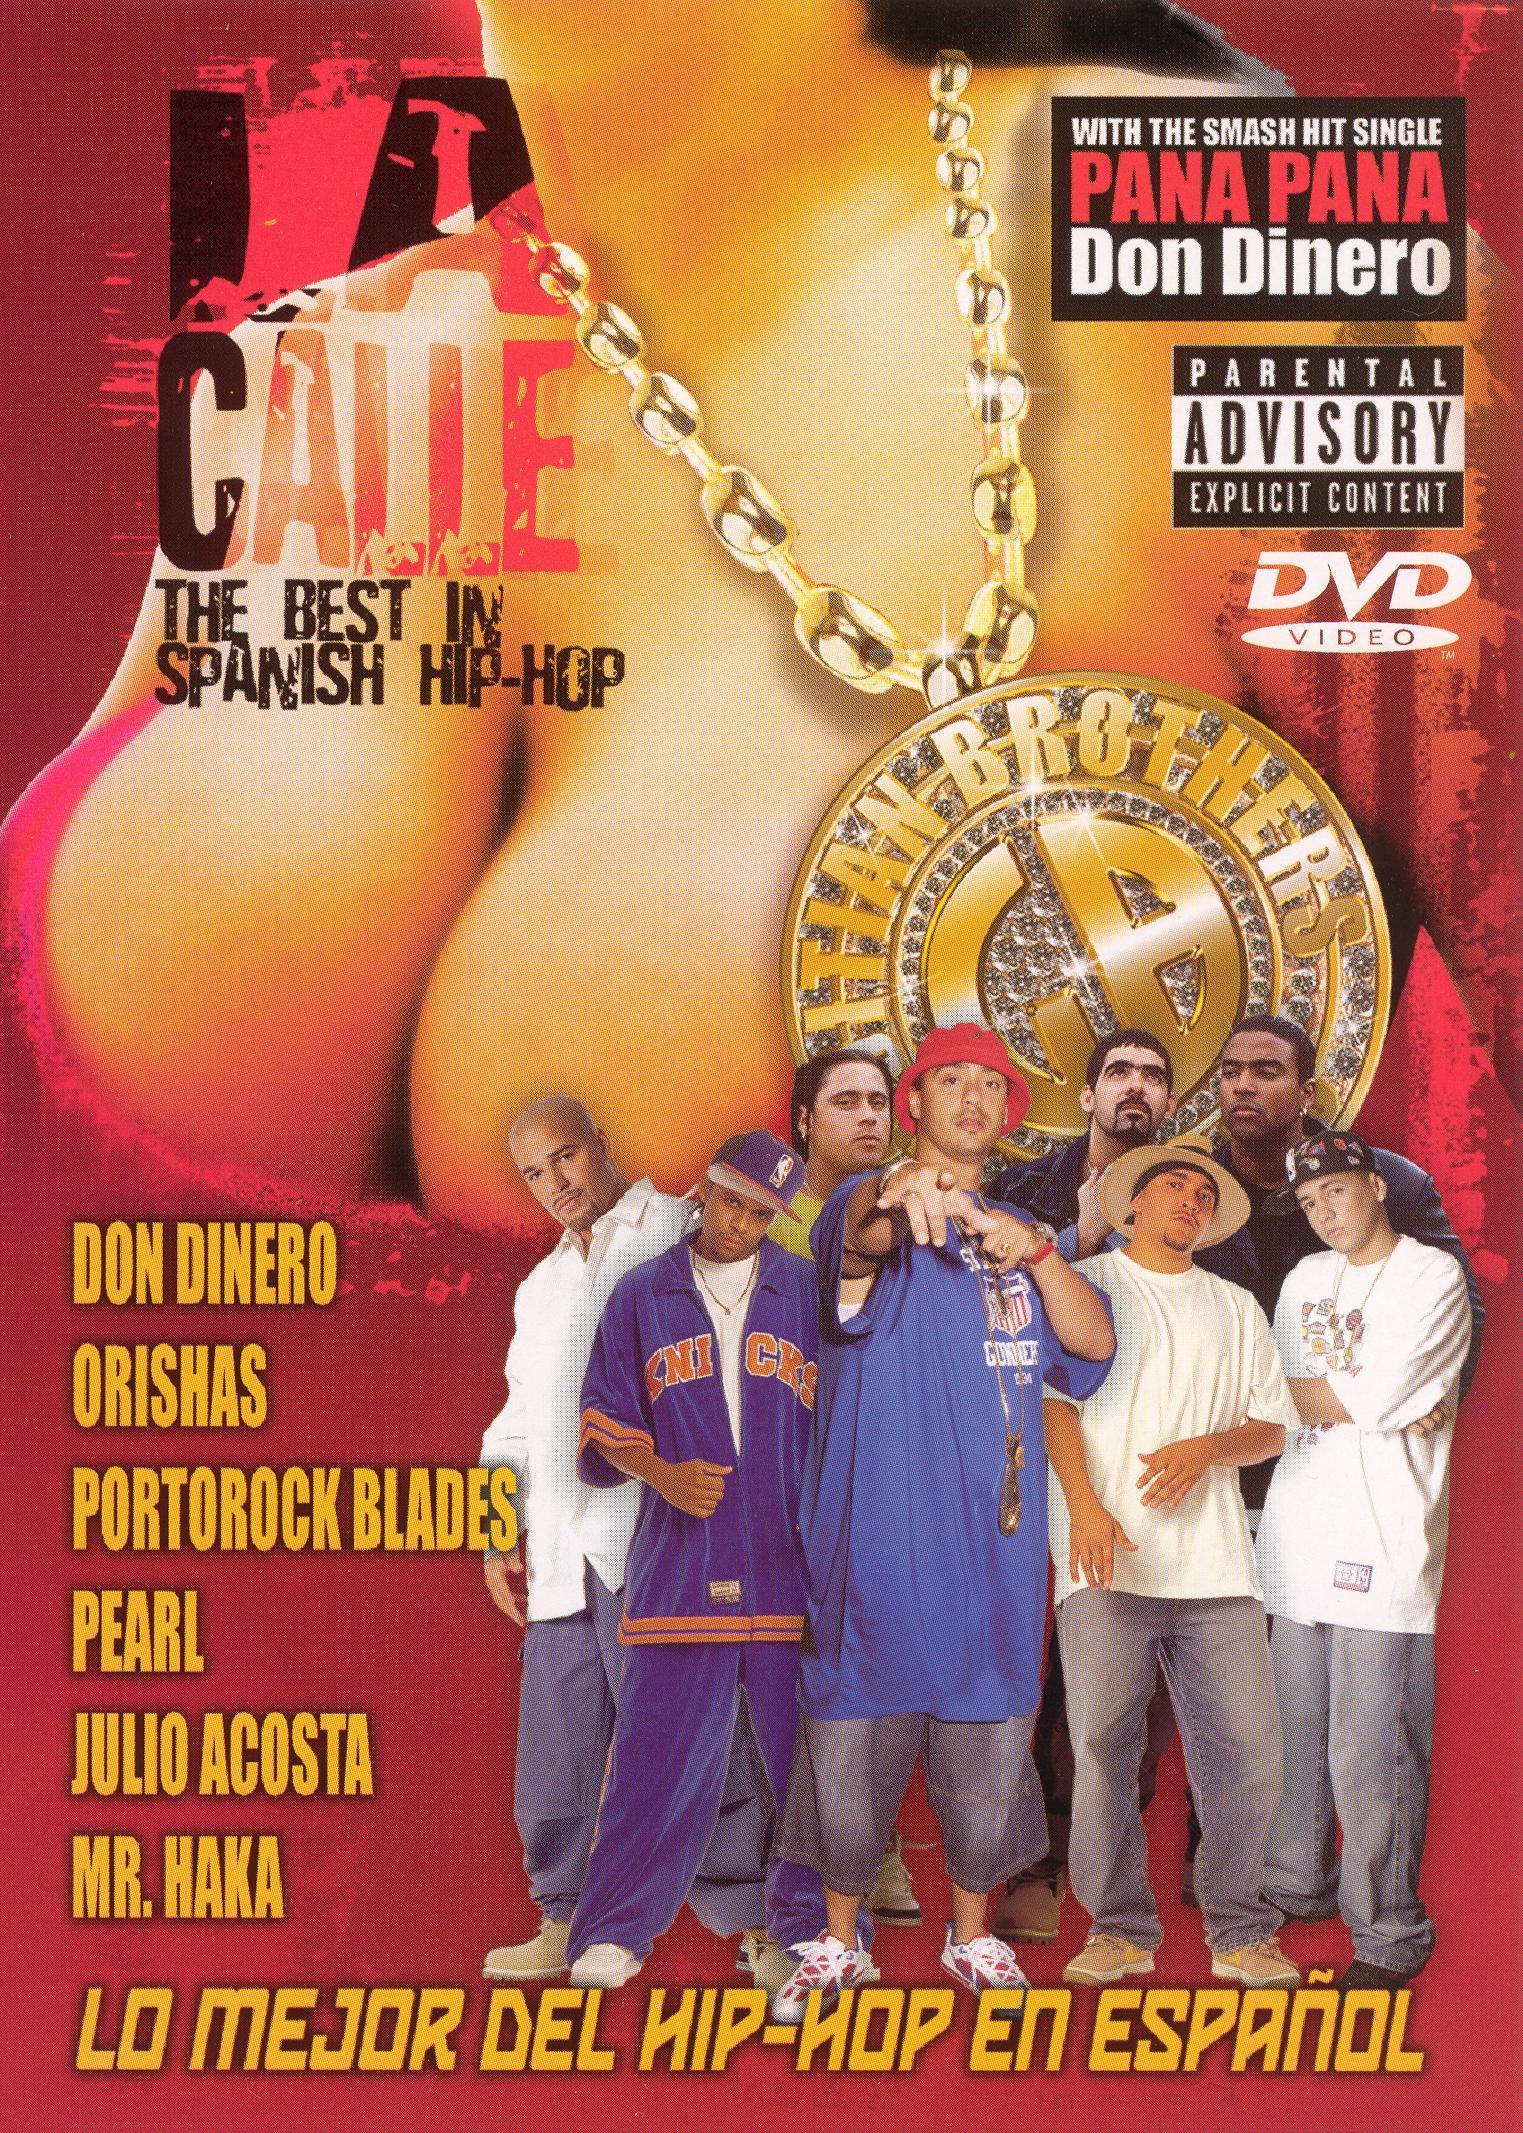 La Calle, Vol. 1: The Best in Spanish Hip Hop